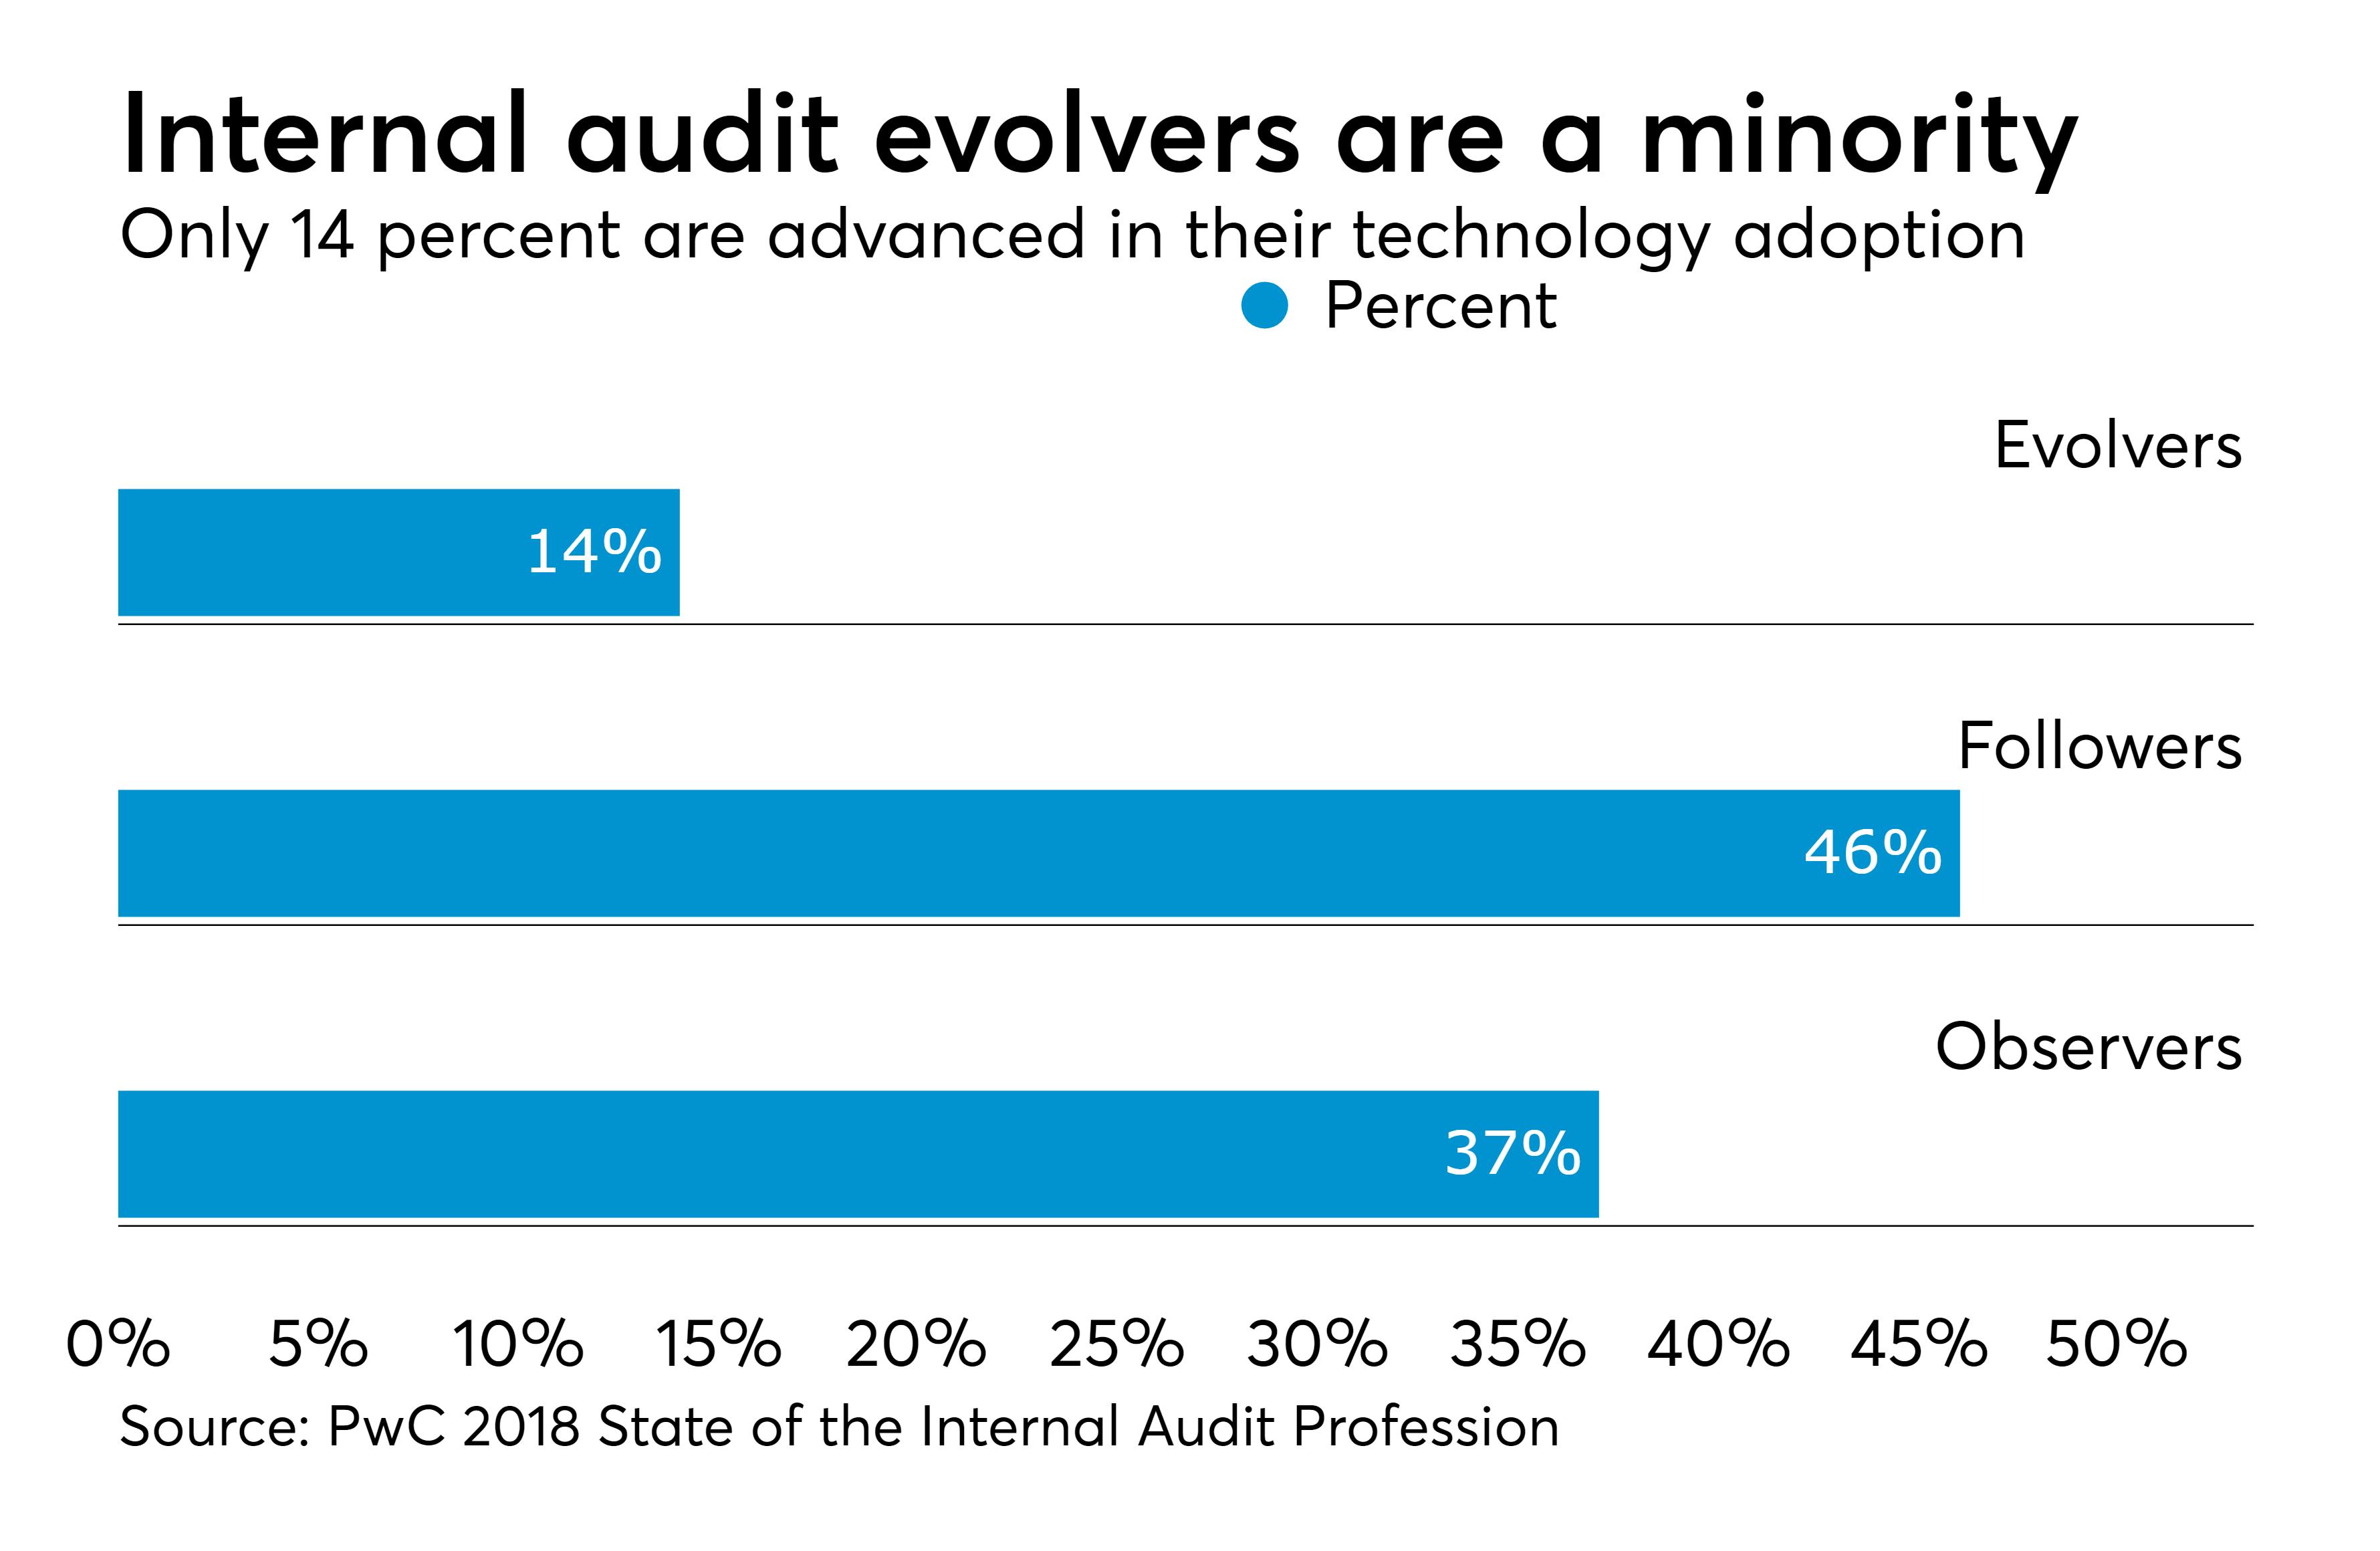 Internal audit profession making tech advances in